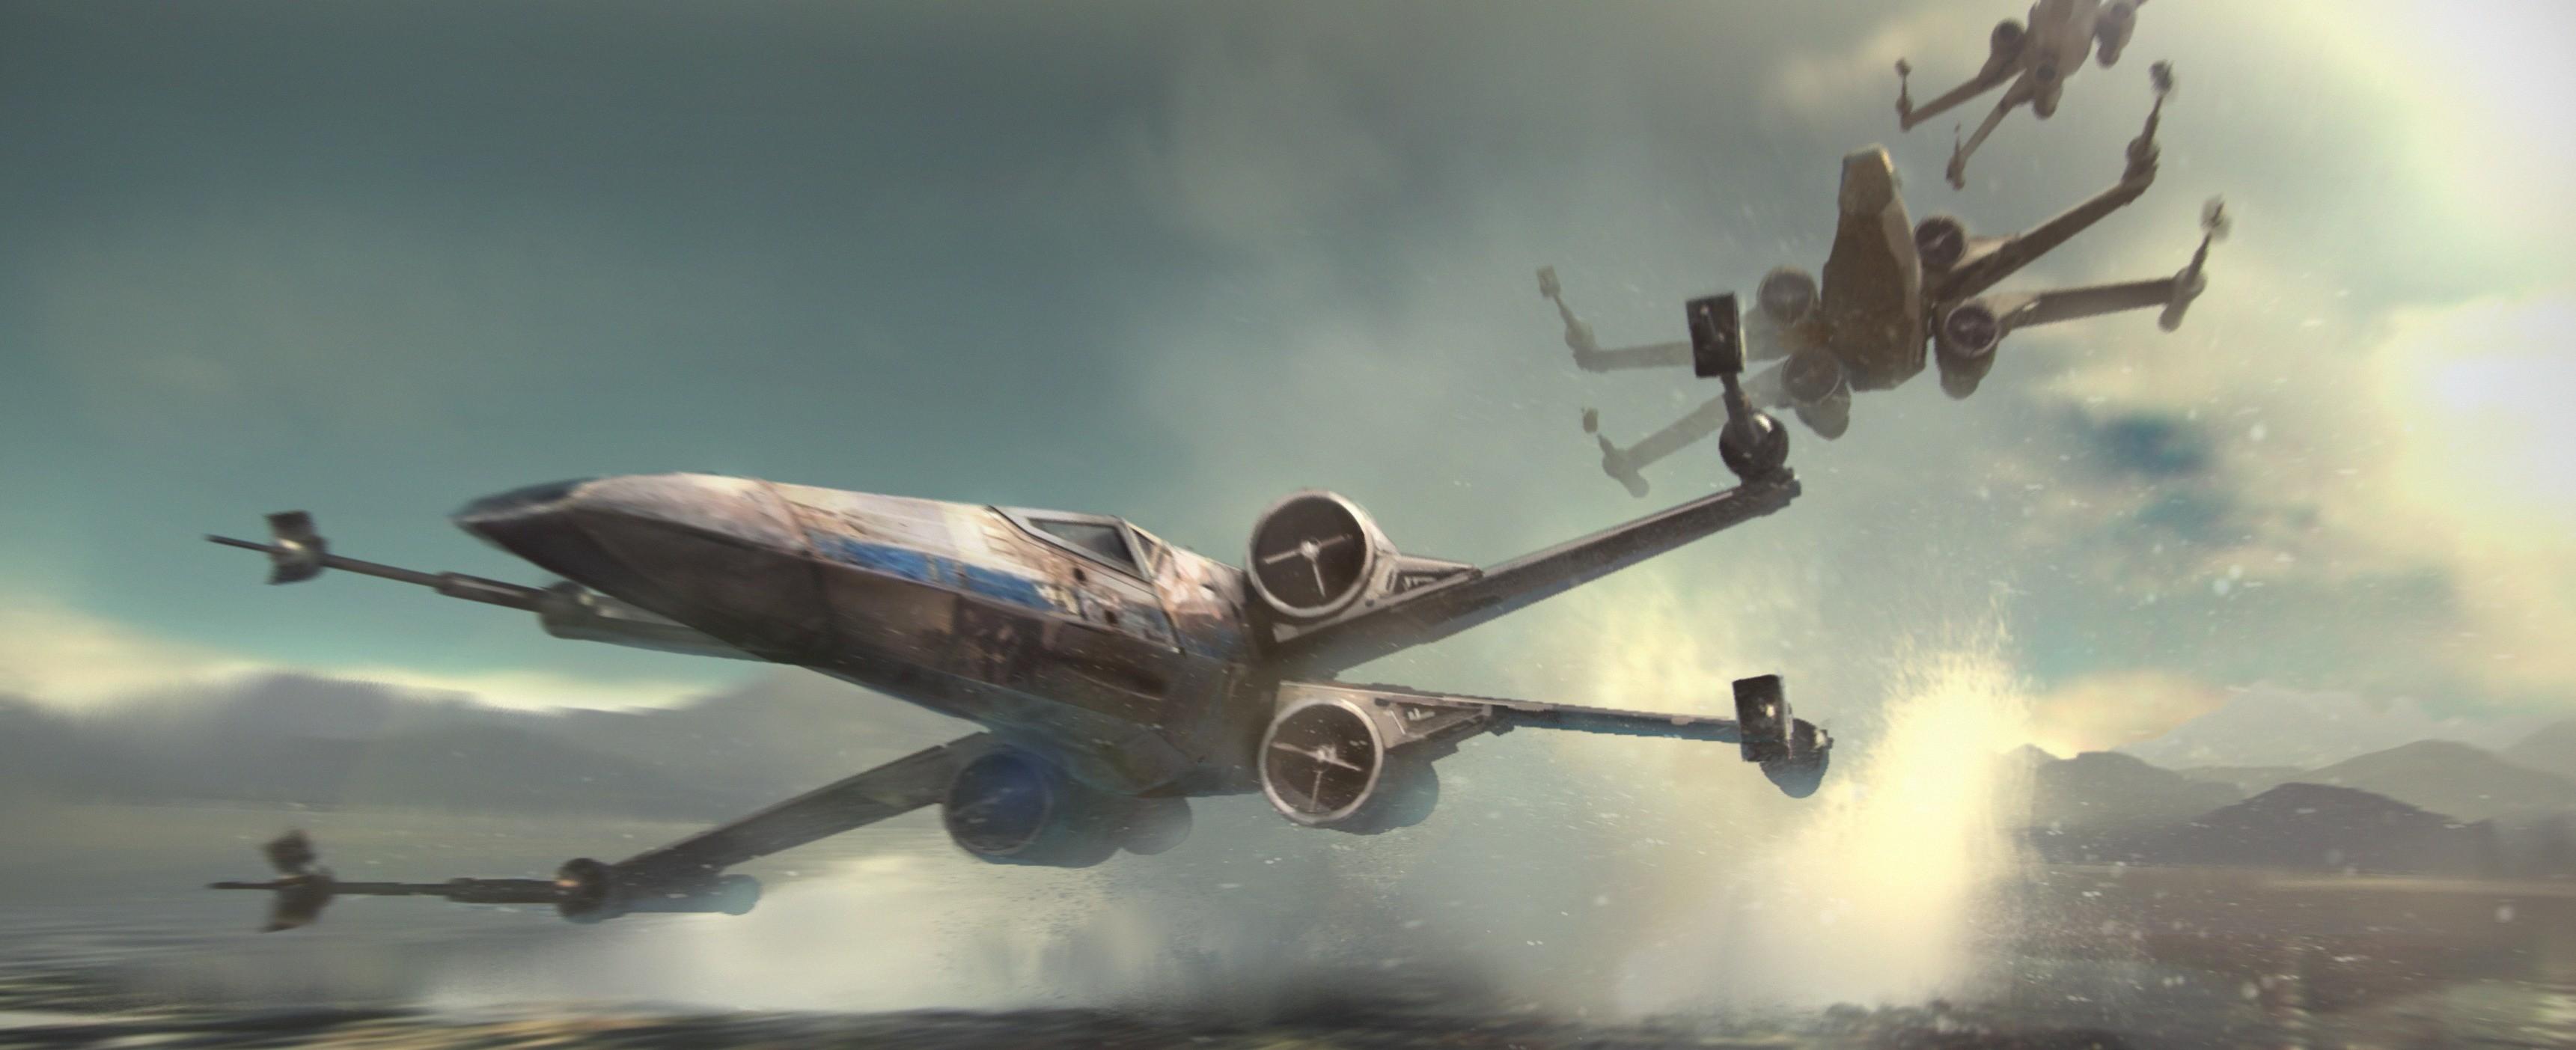 Movie – Star Wars Episode VII: The Force Awakens Star Wars X-Wing Wallpaper